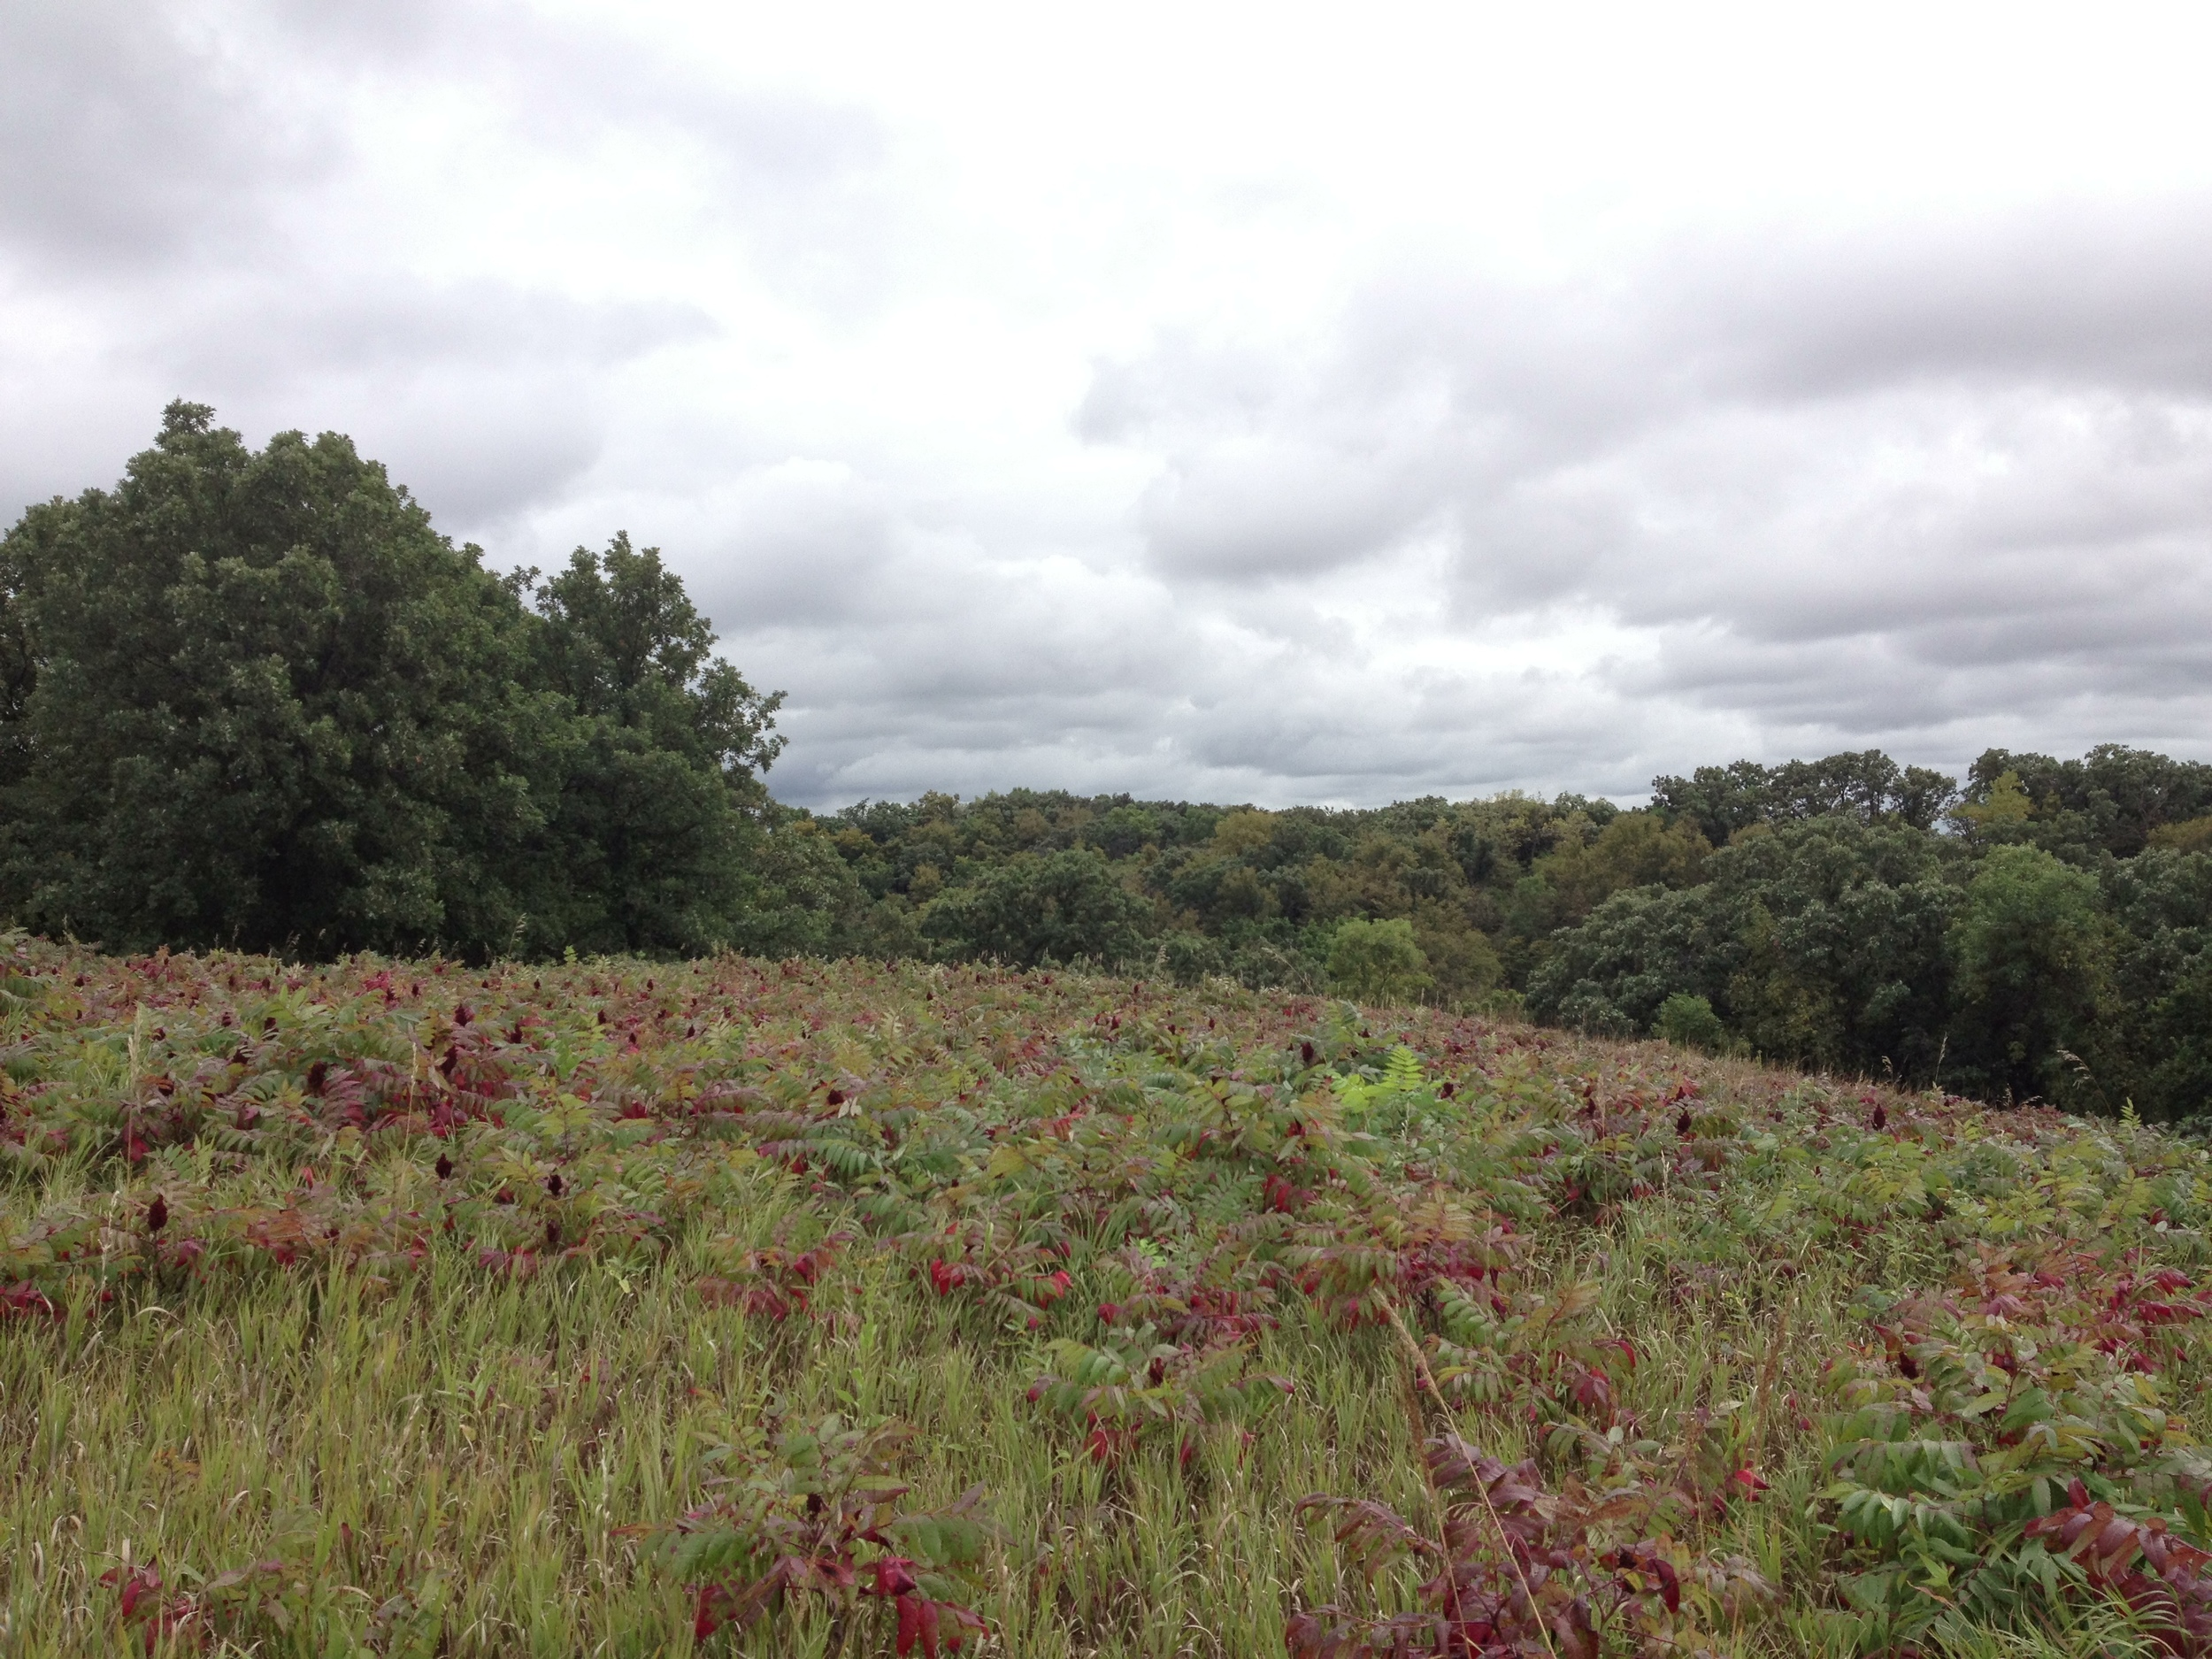 Sumac at Camden State Park